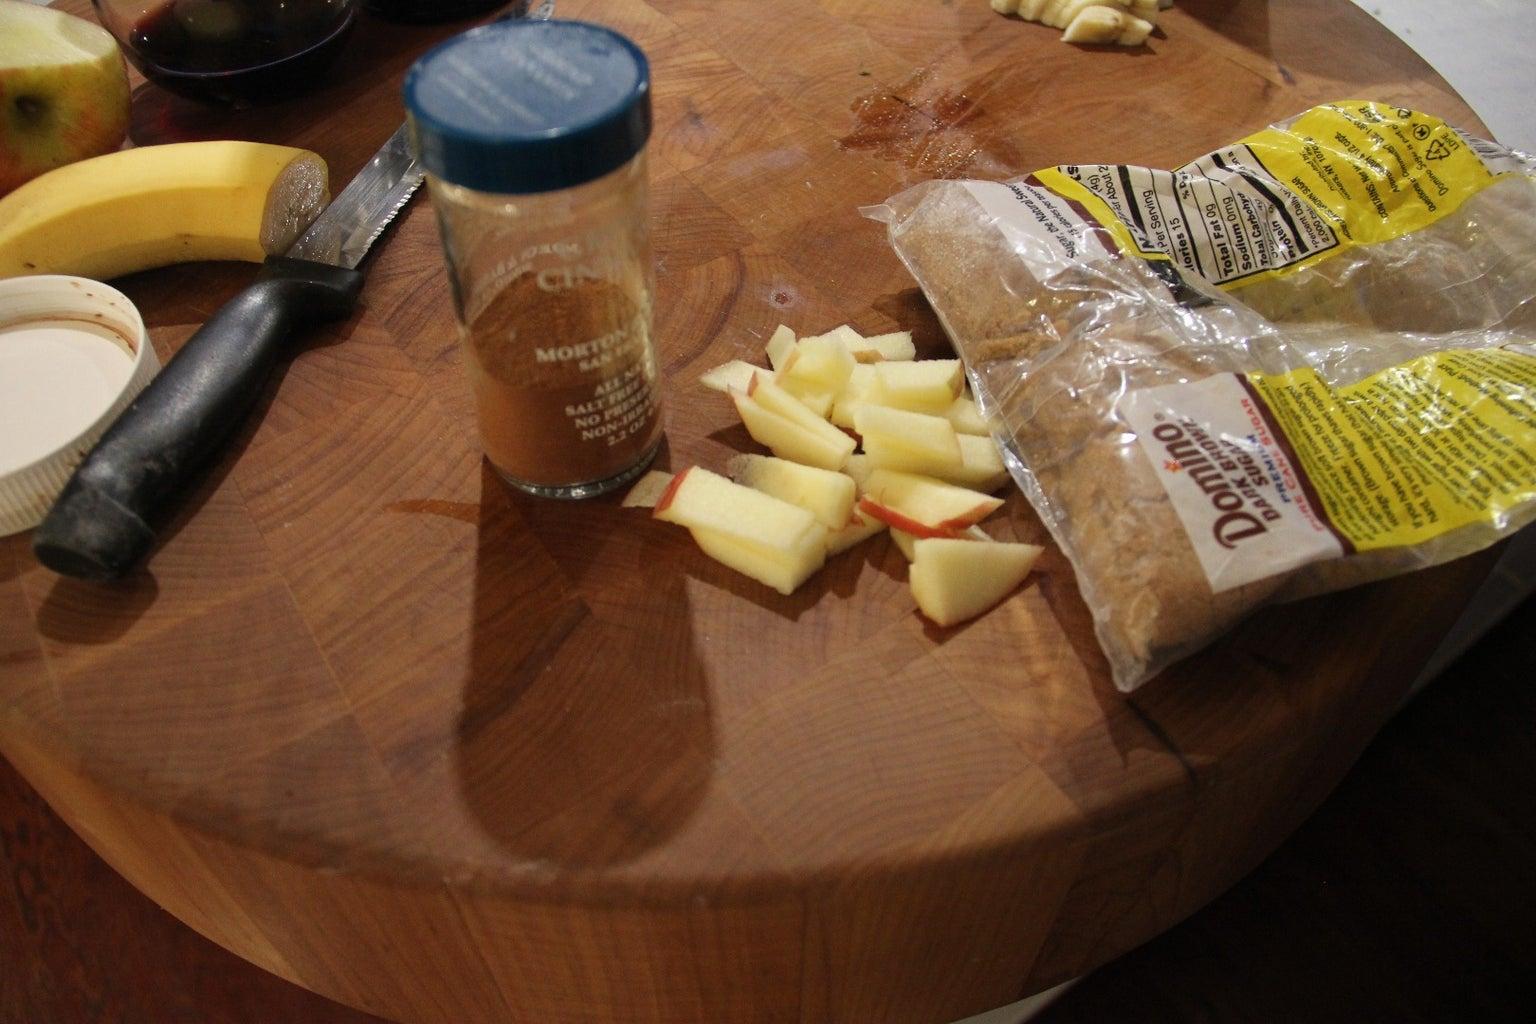 Apples and Brown Sugar and Cinnamon !